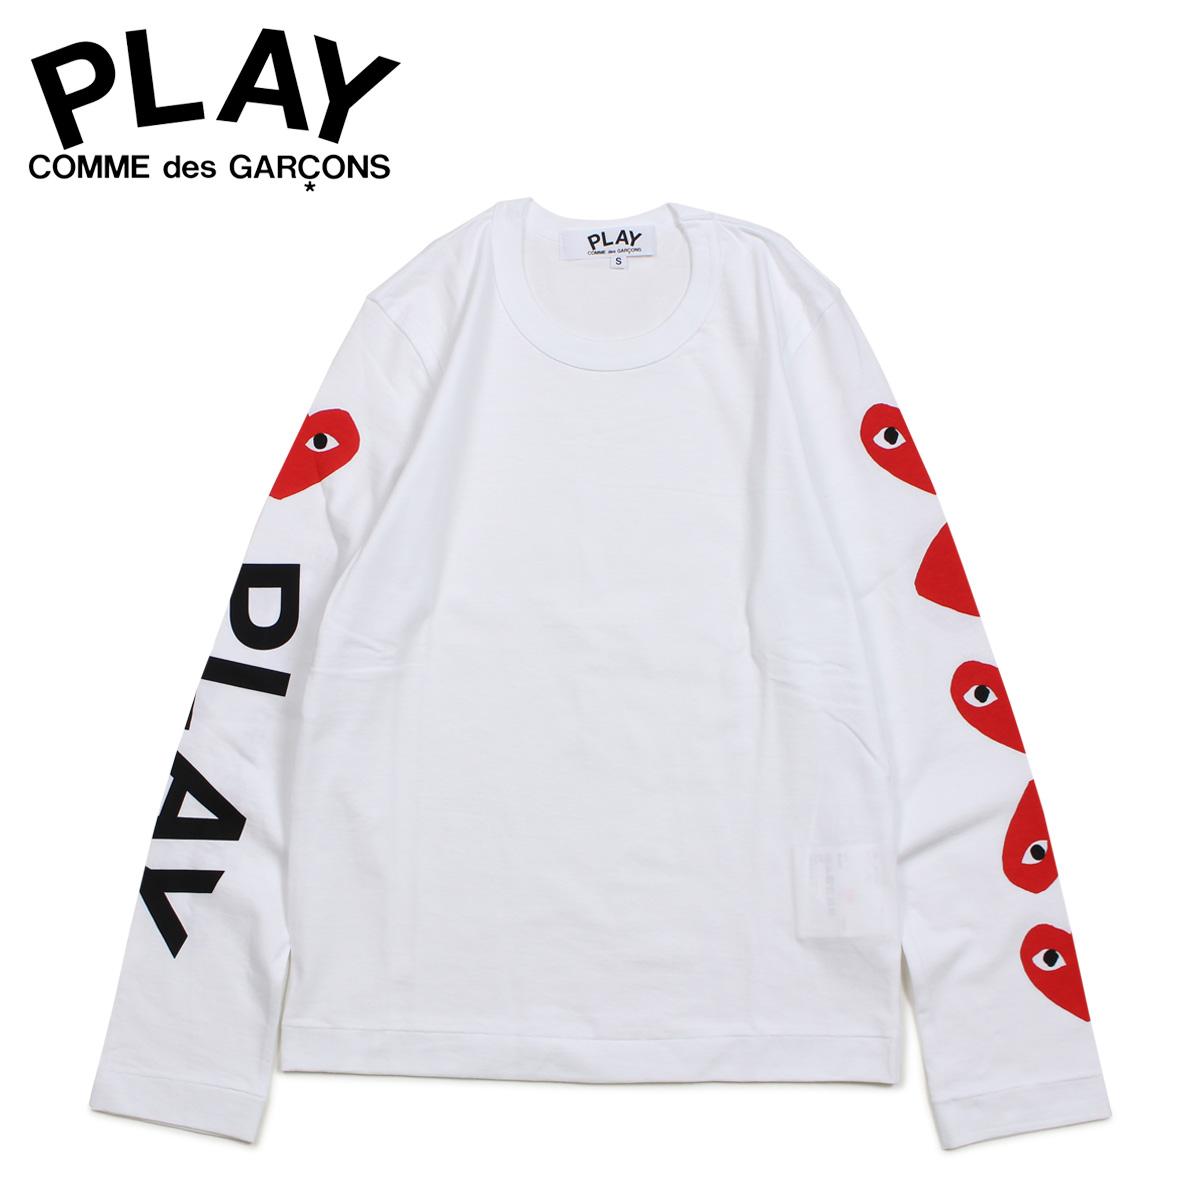 PLAY COMME des GARCONS RED HEART LONG SLEEVE コムデギャルソン Tシャツ レディース 長袖 ロンT ホワイト 白 AZ-T261 [3/29 新入荷]